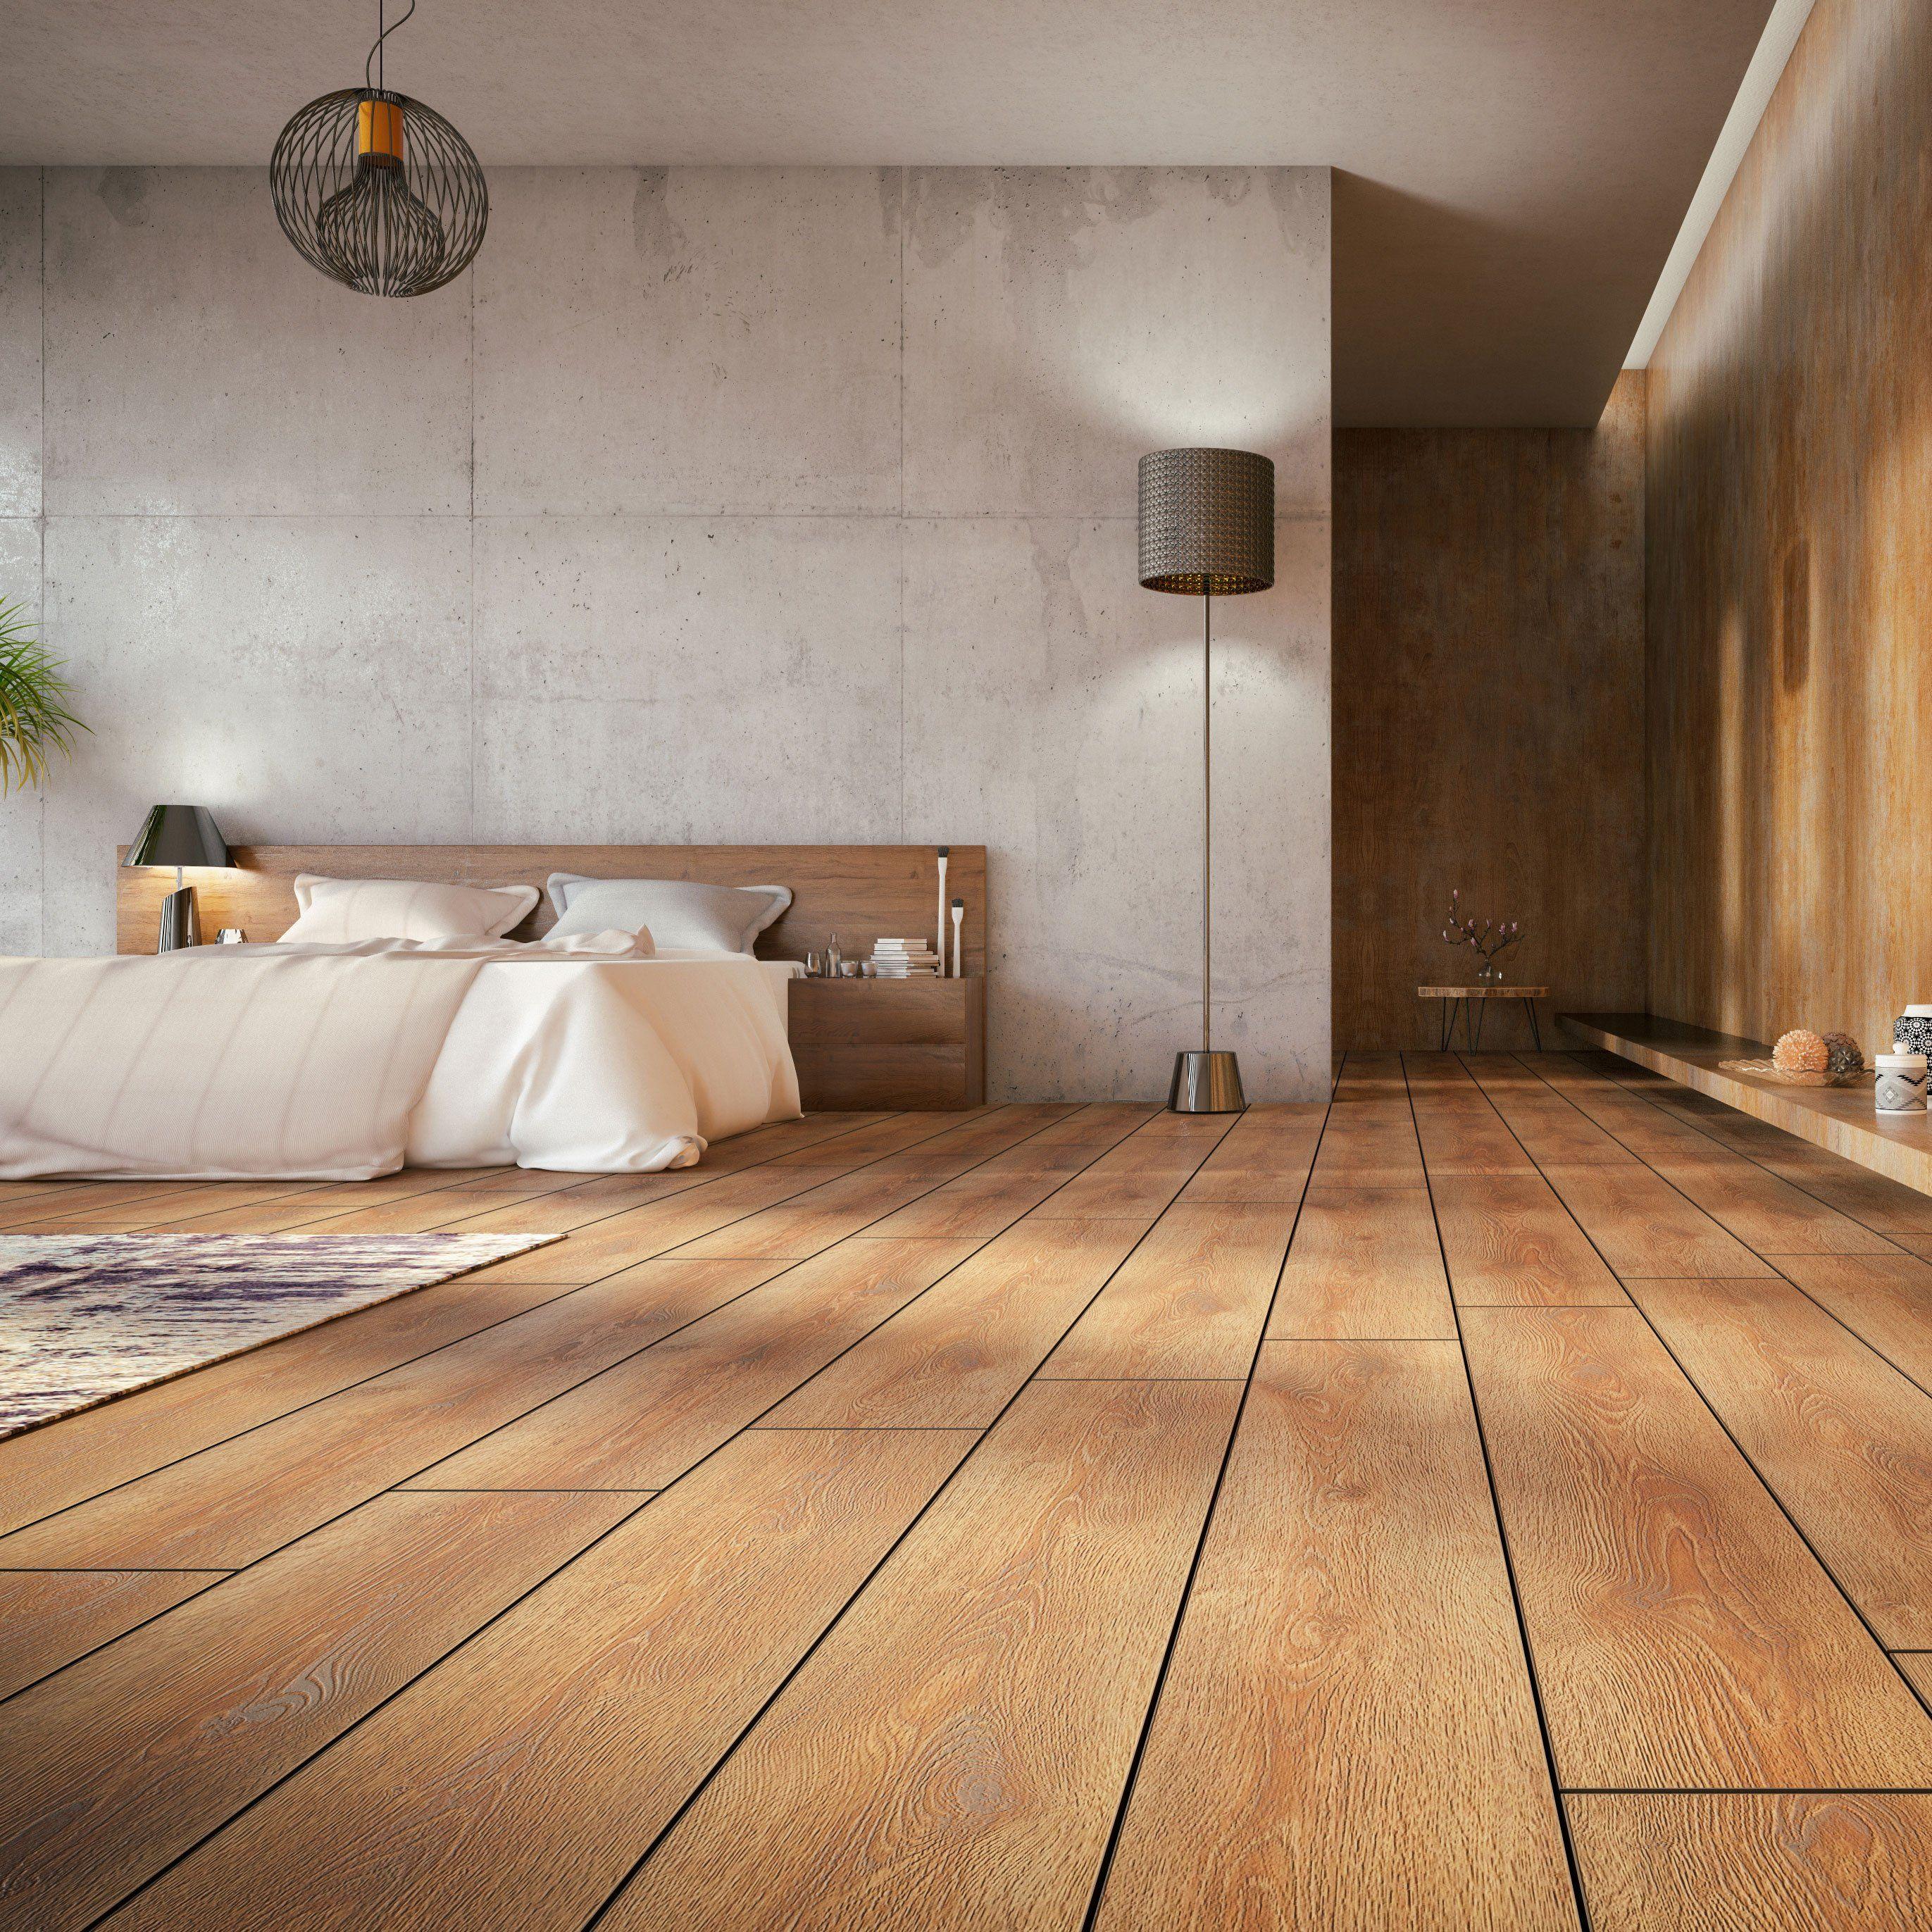 Flooring Ideas for the Bedroom | Refinishing hardwood ...